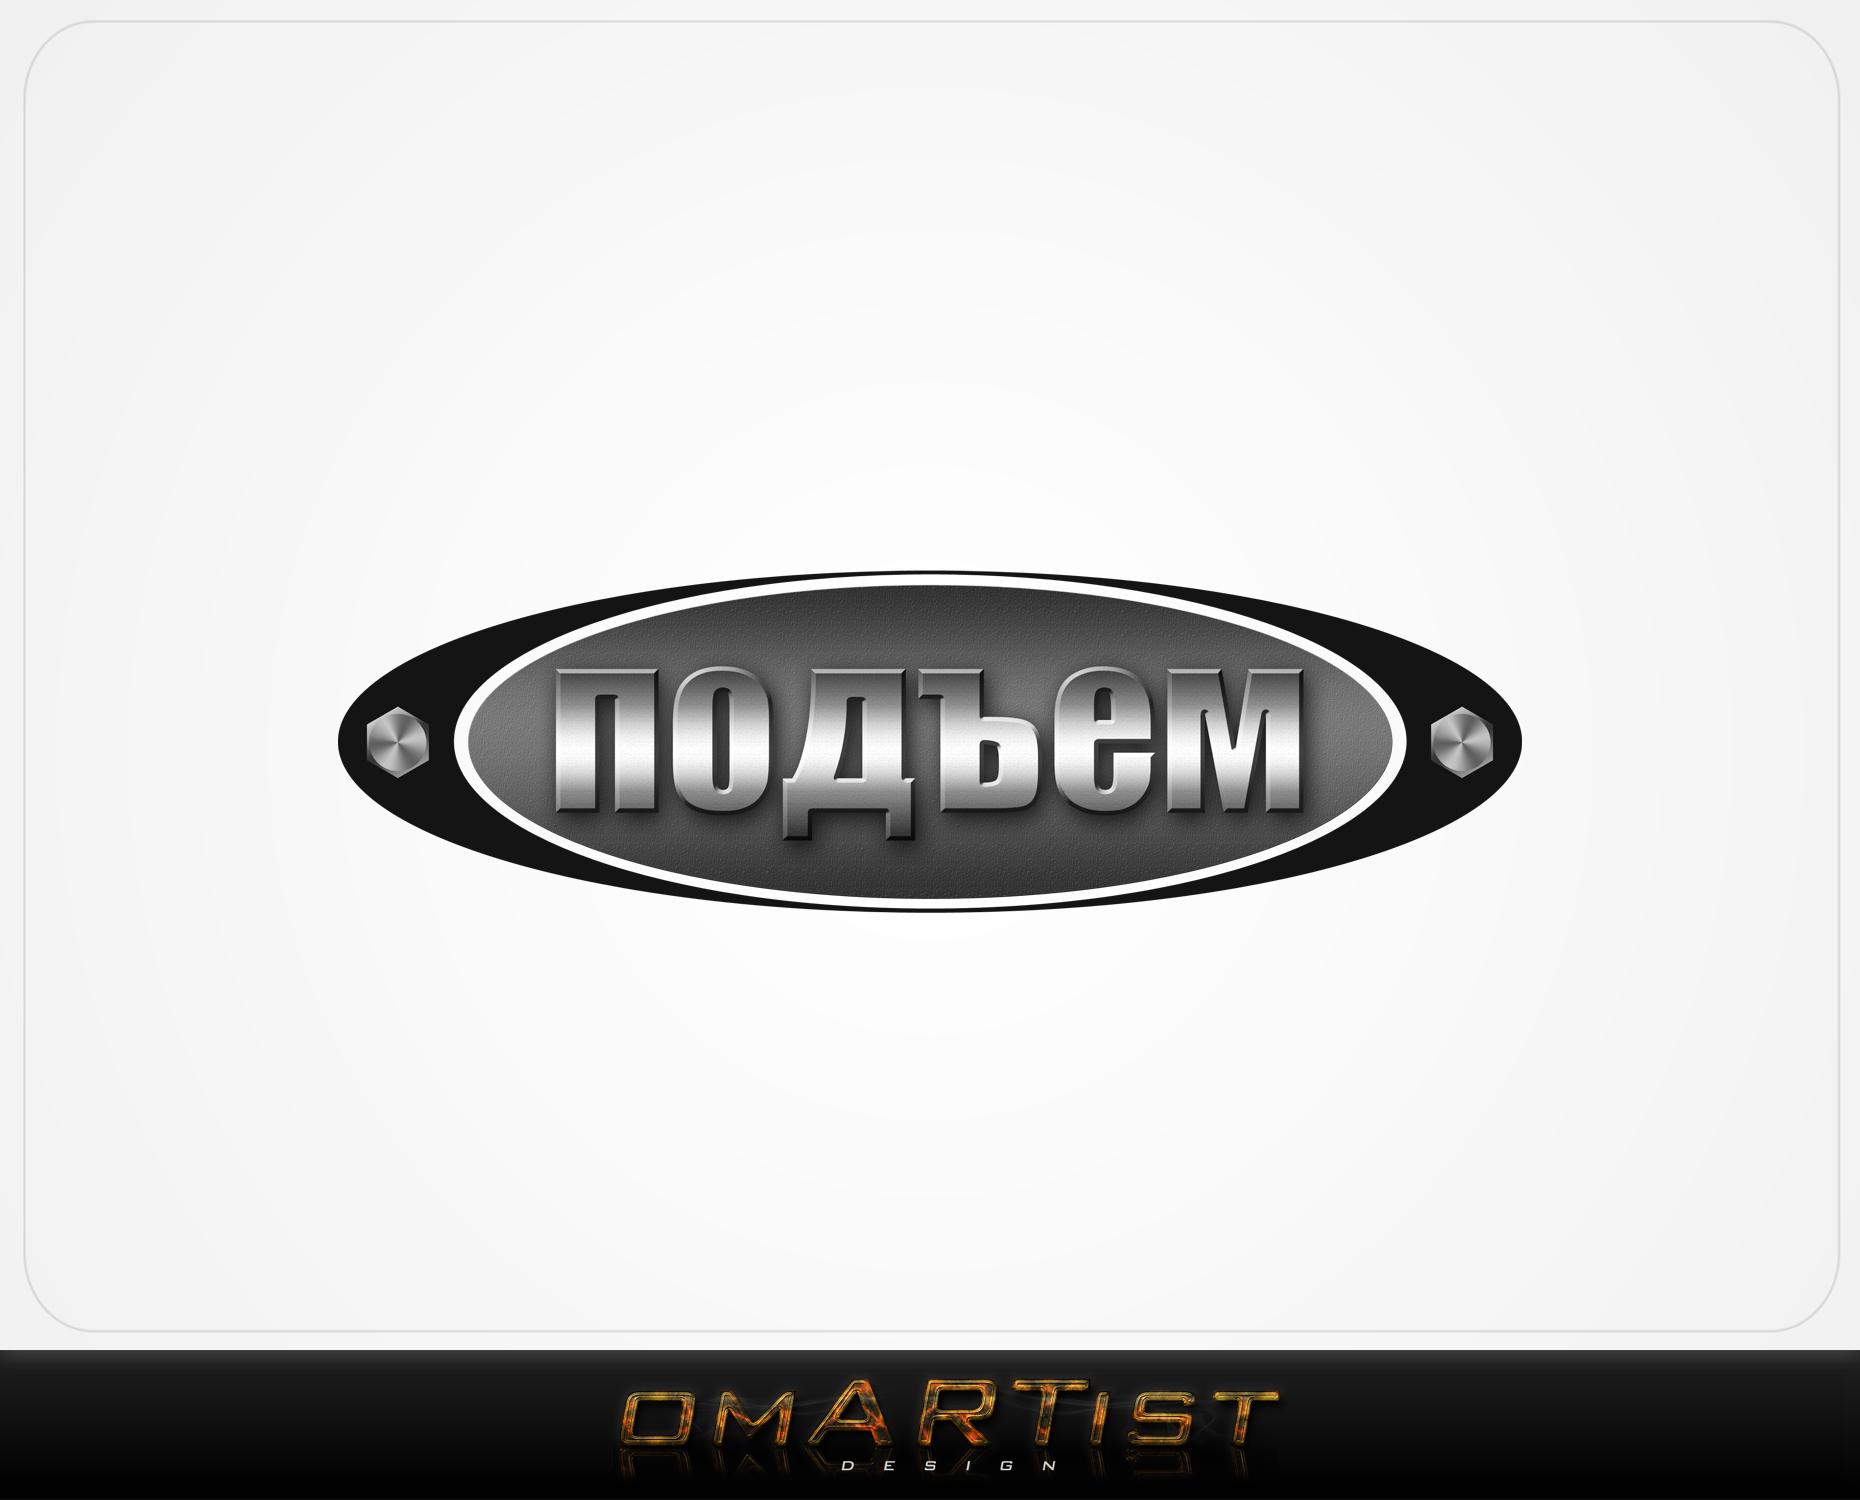 Logo Design by omARTist - Entry No. 42 in the Logo Design Contest Artistic Logo Design for подъем.